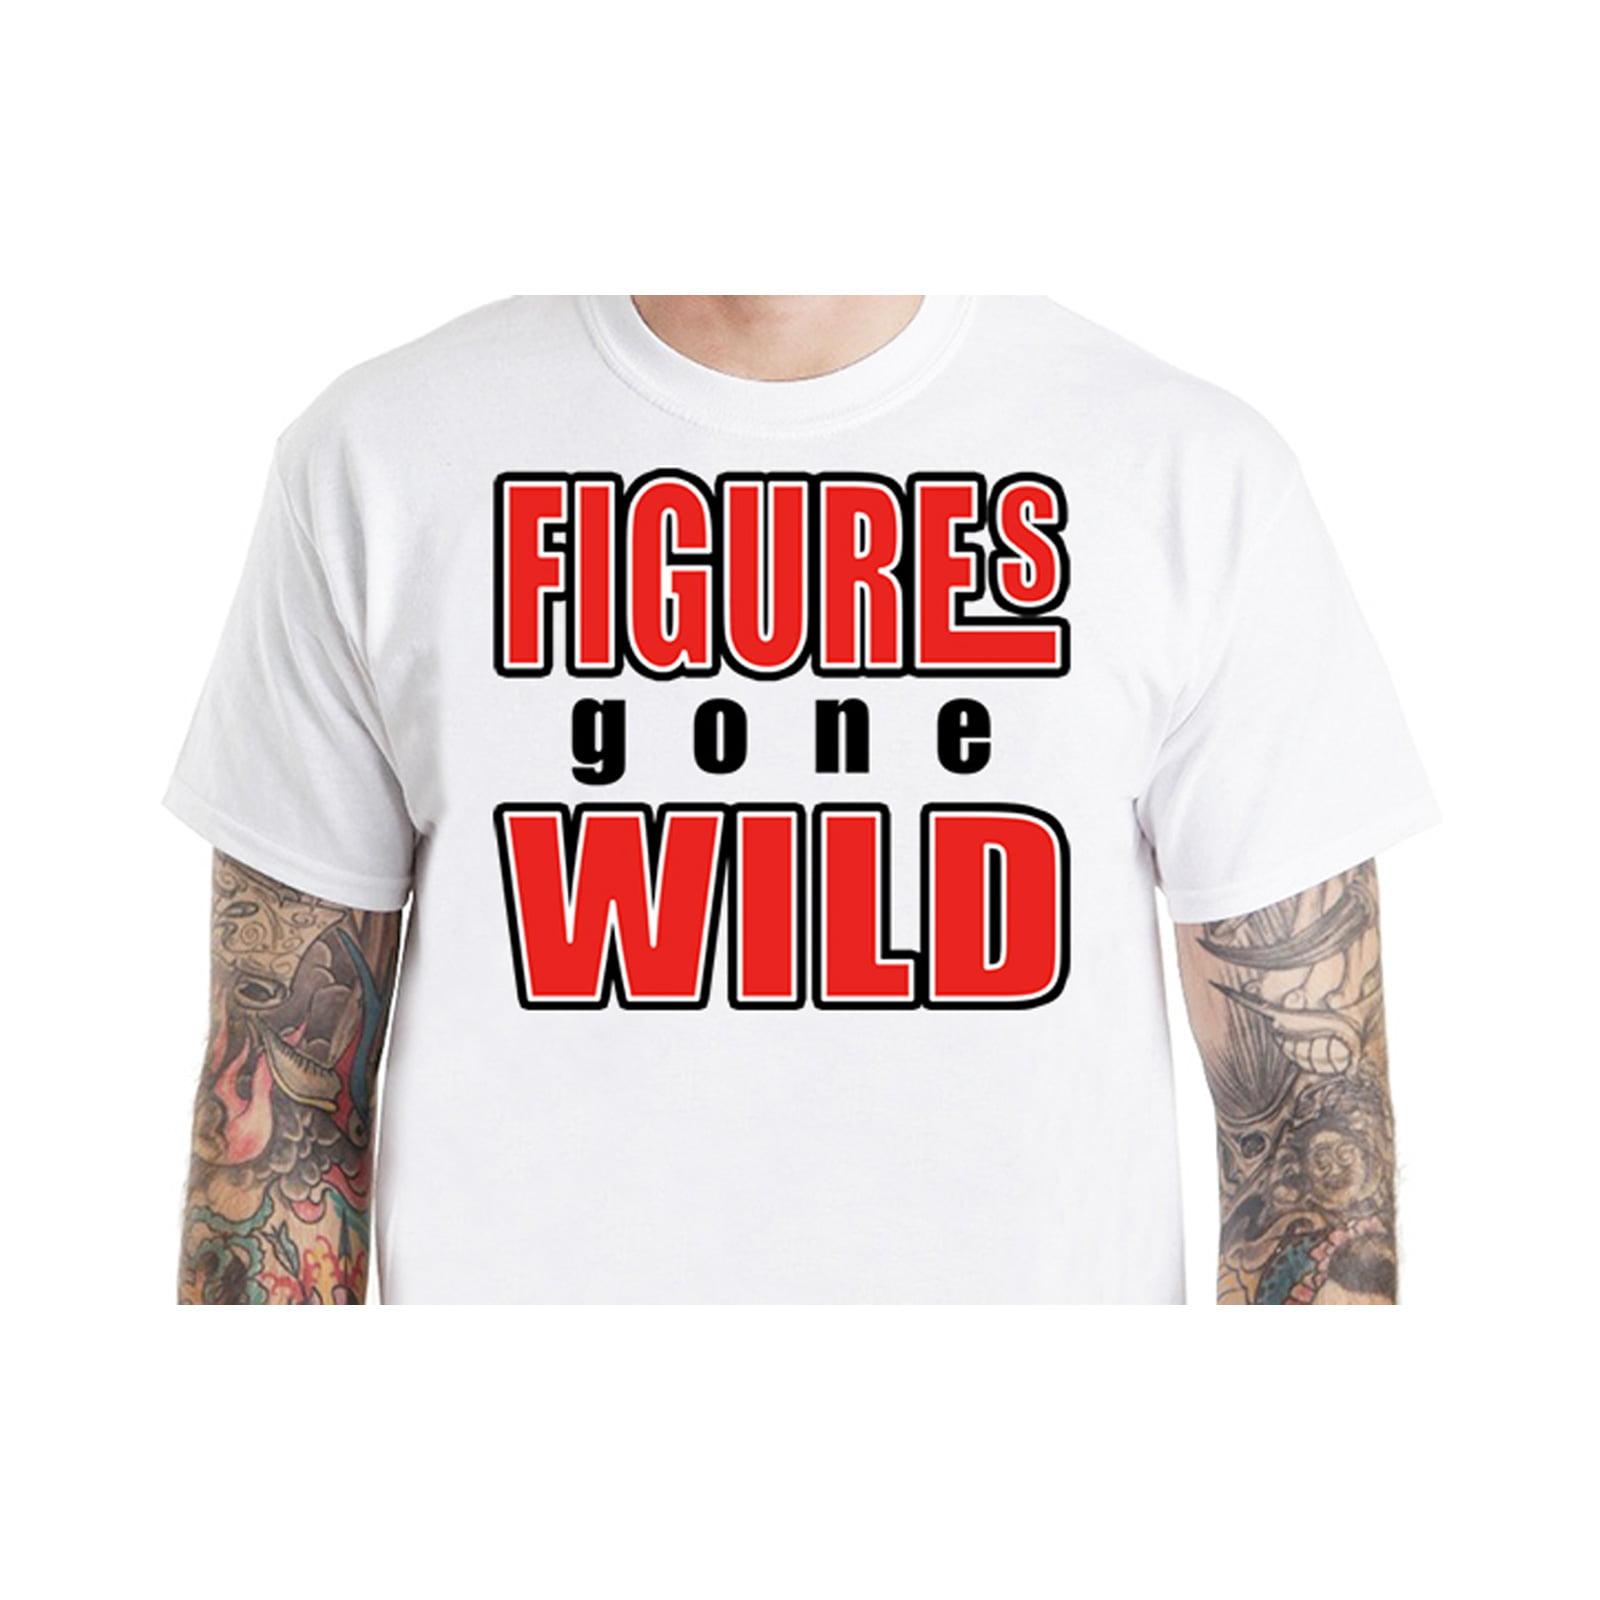 Figures Gone Wild T-Shirt Design